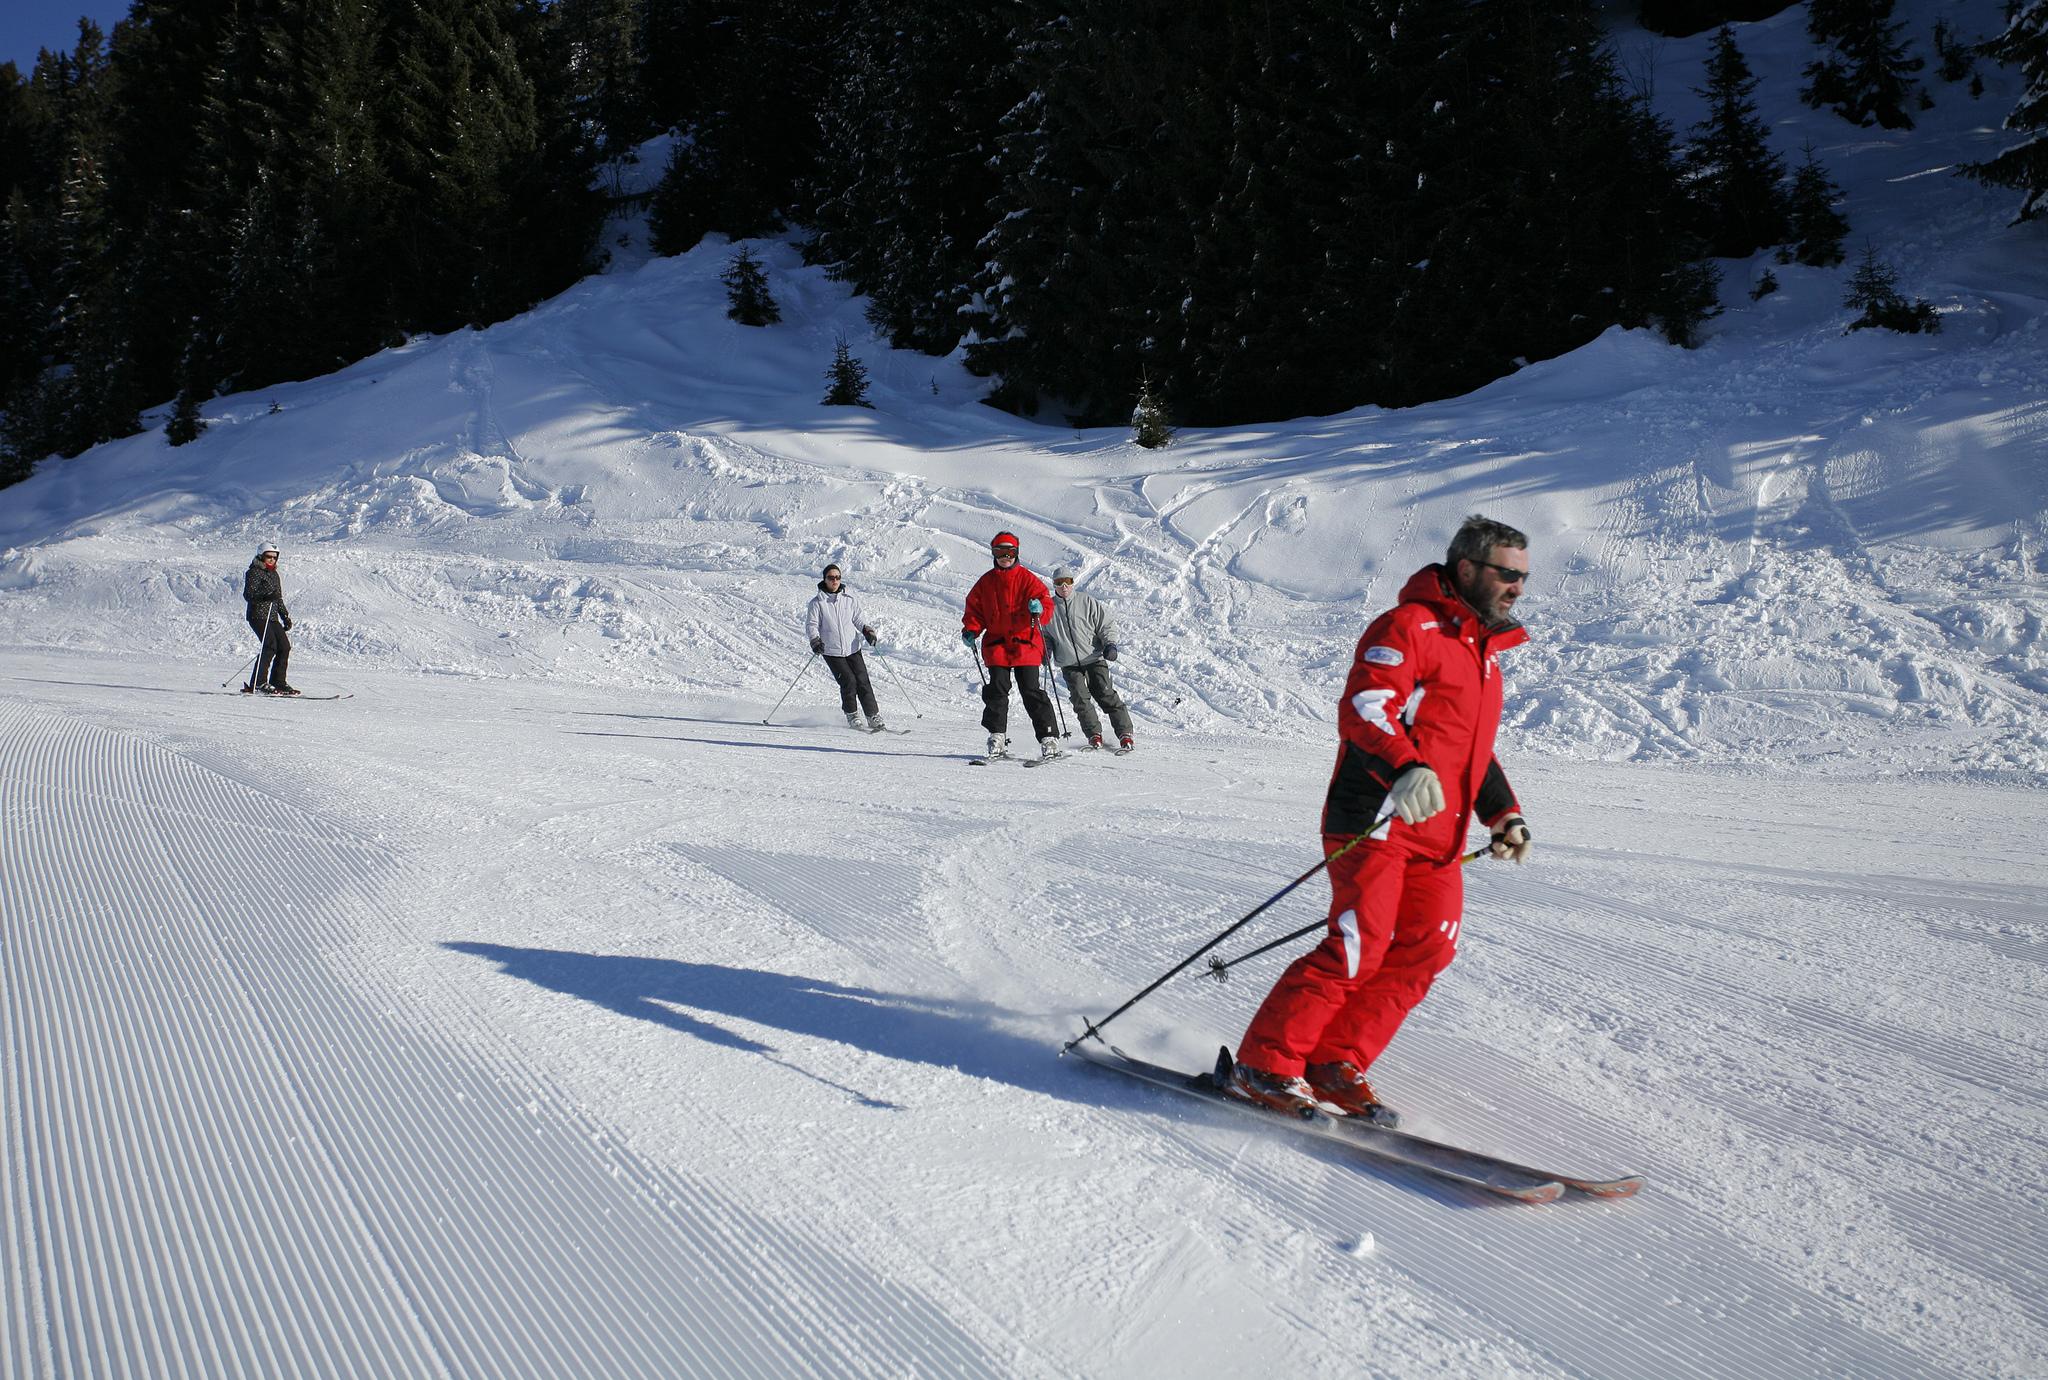 Cours de ski collectif Avoriaz - Gilles Gallas - Avoriaz Tourisme